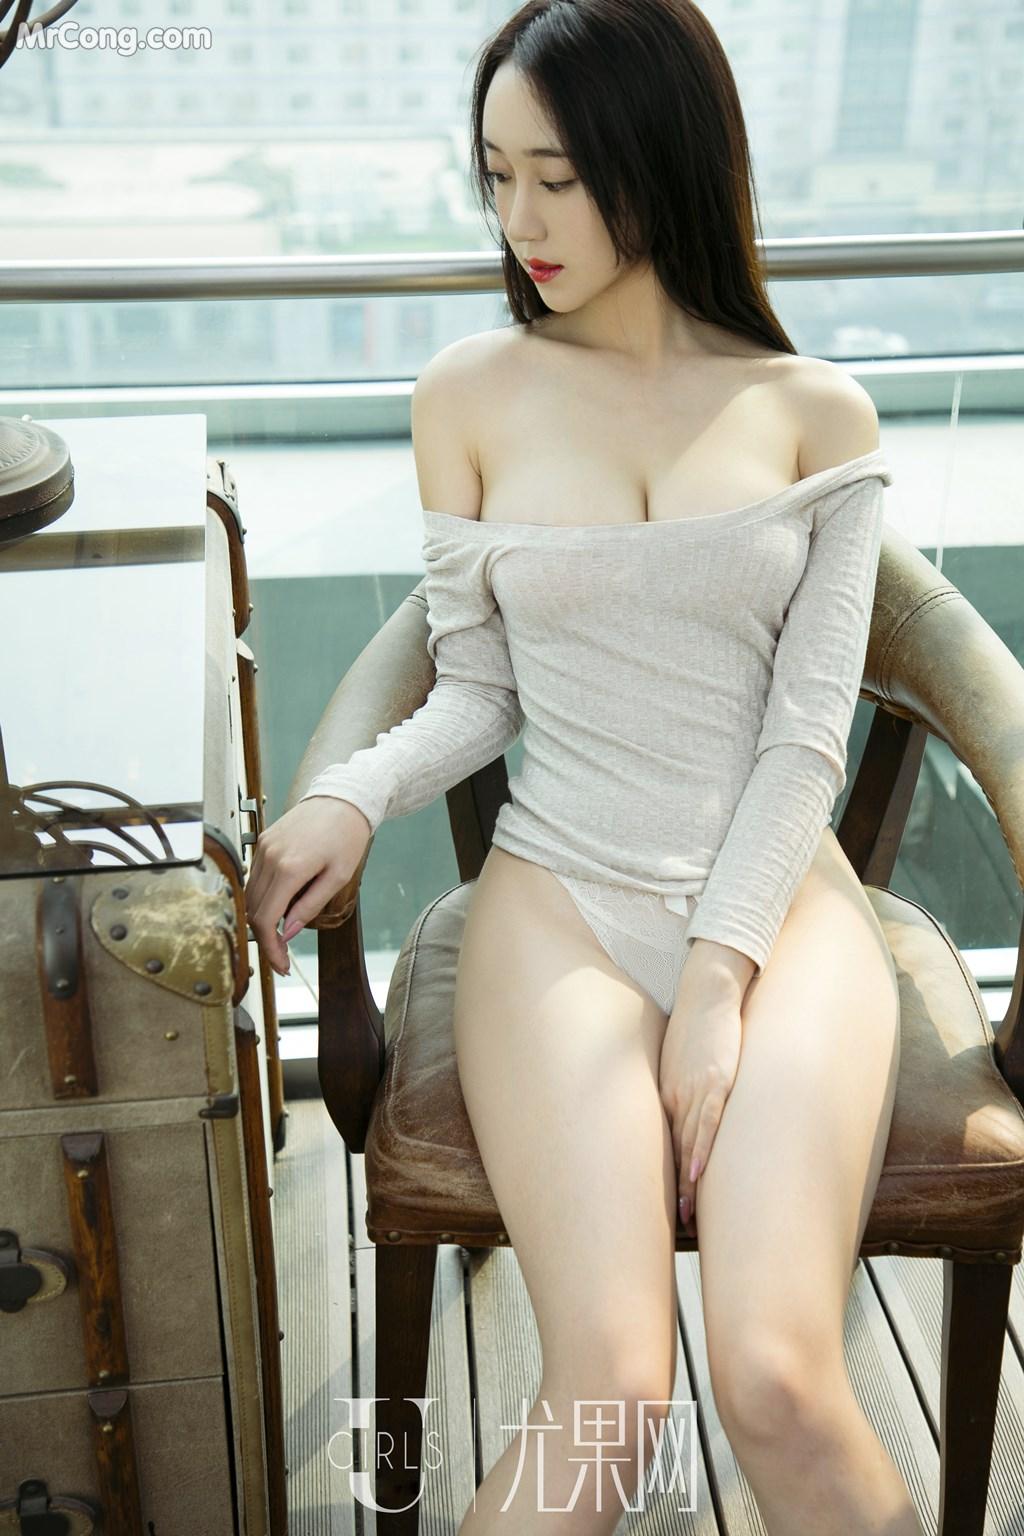 Image UGIRLS-U354-Li-Bao-Er-MrCong.com-005 in post UGIRLS U354: Người mẫu Li Bao Er (李宝儿) (66 ảnh)